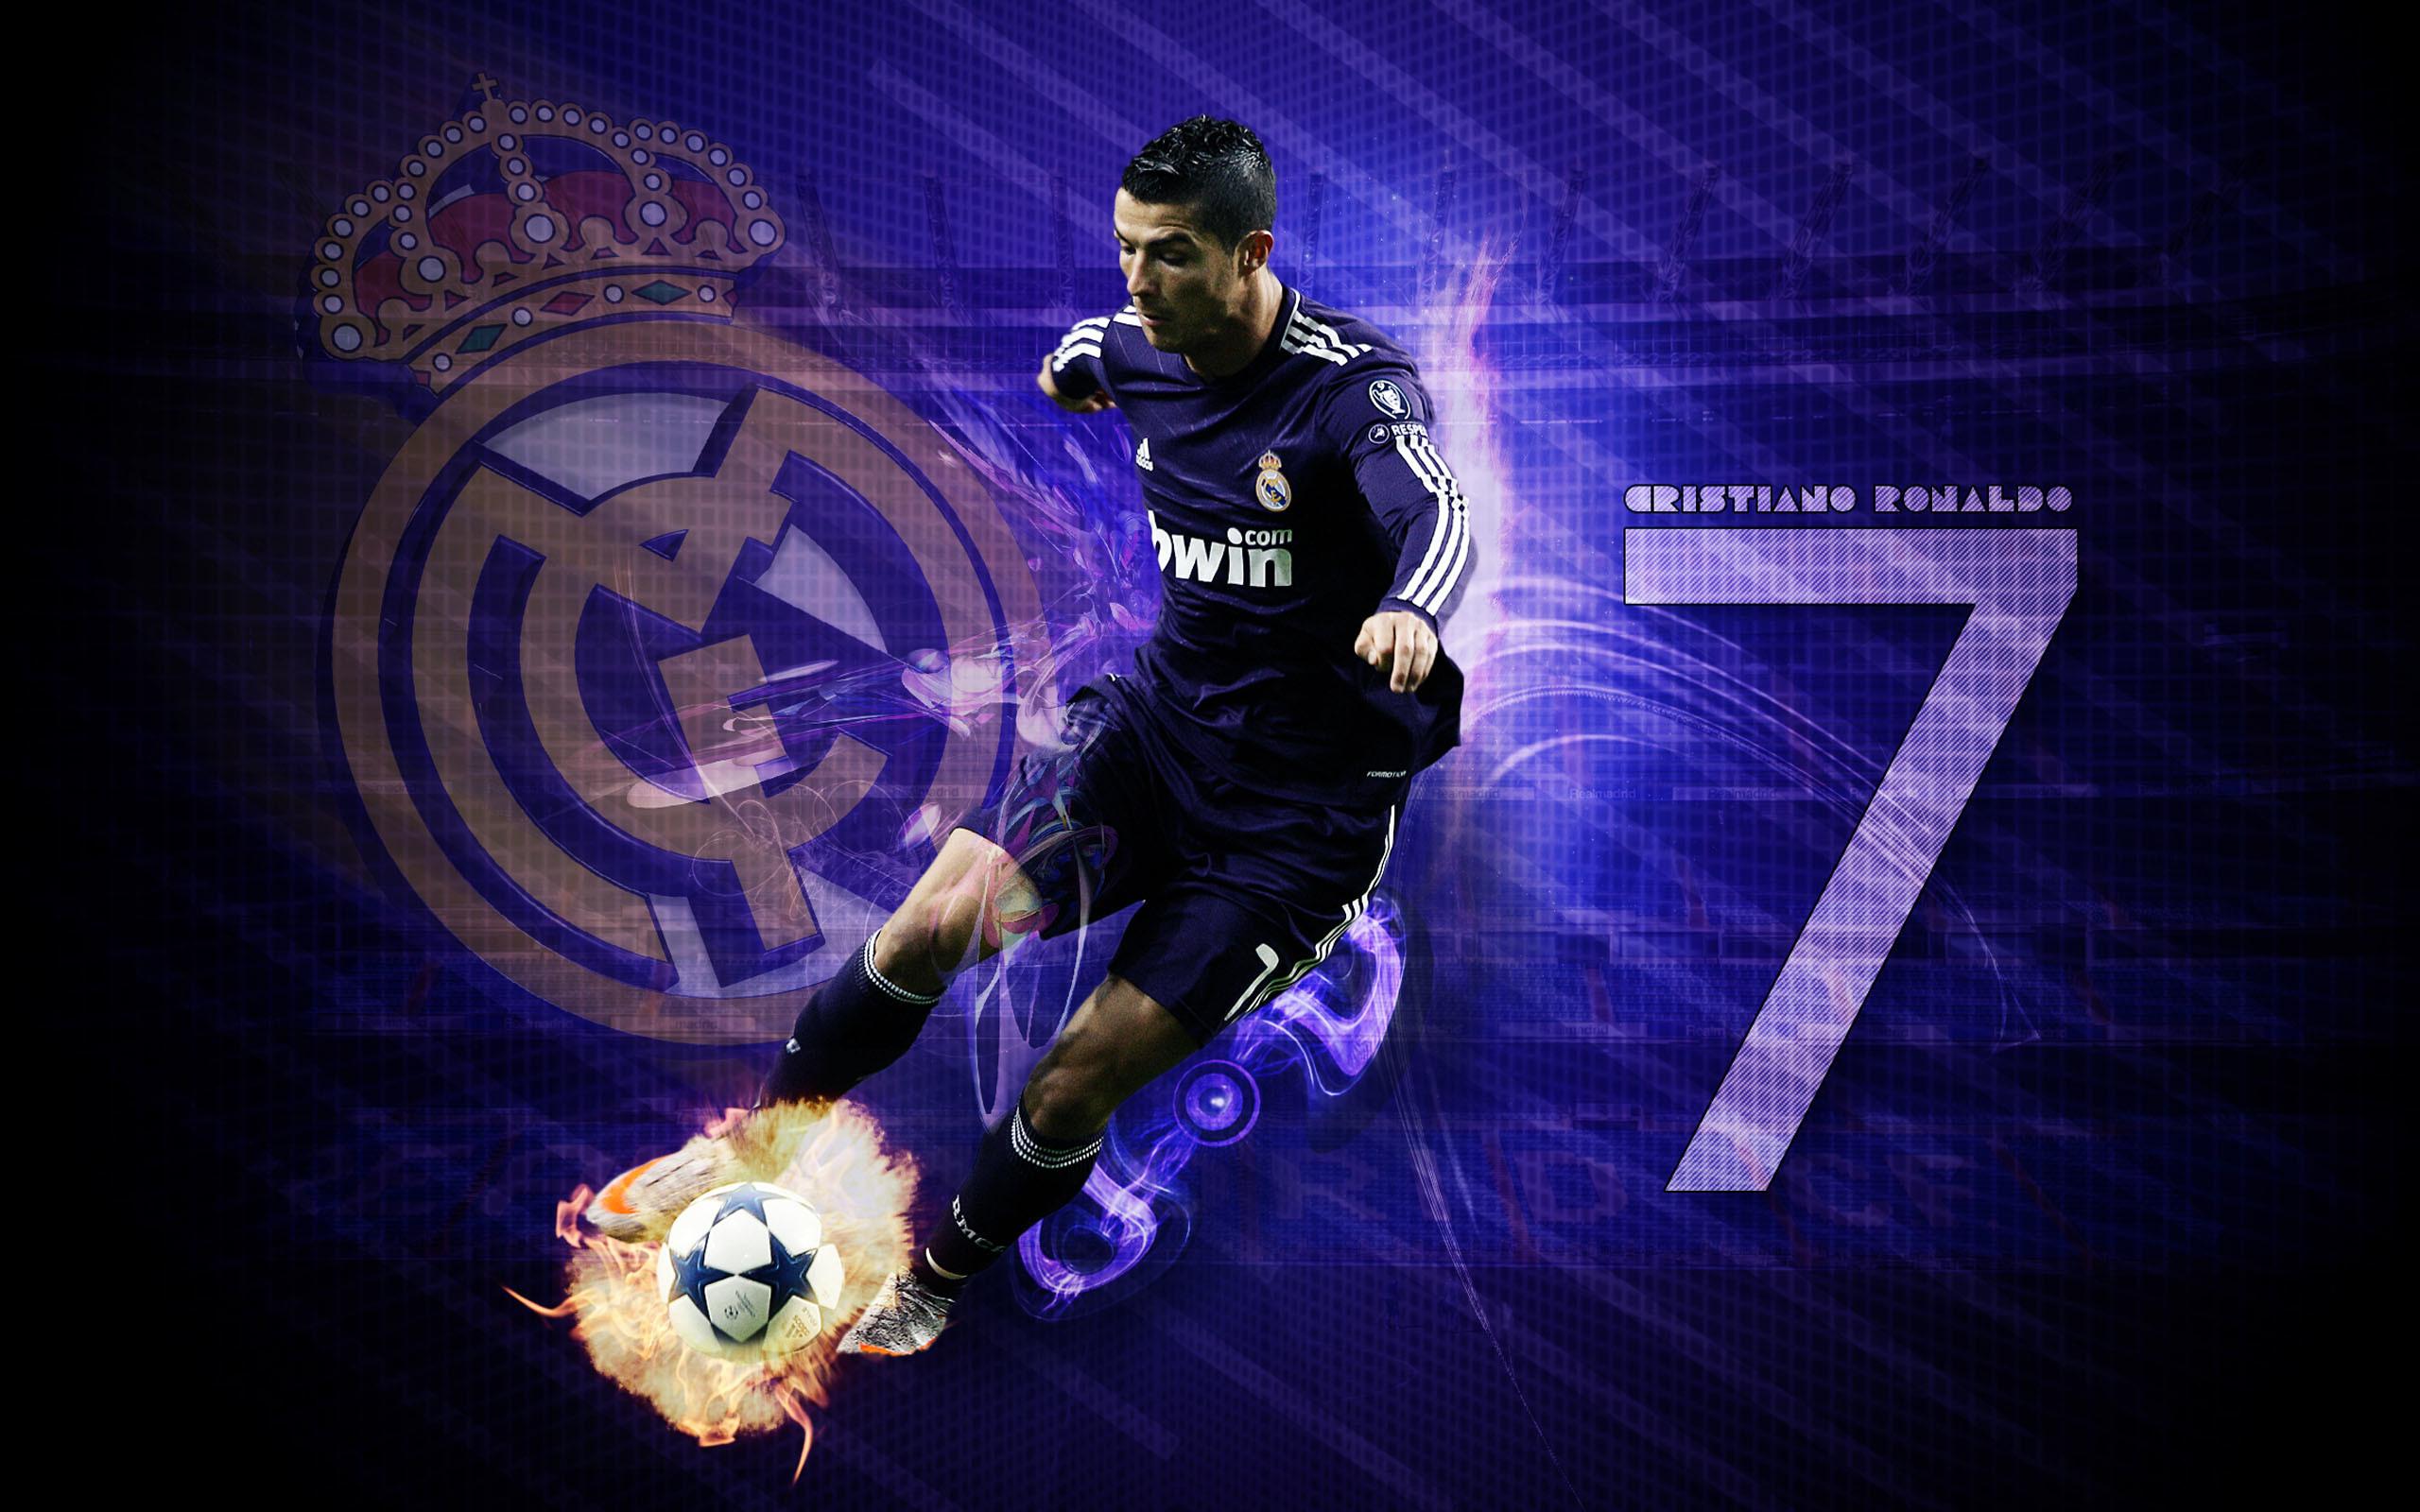 Res: 2560x1600, cristiano-ronaldo-real-madrid-wallpaper-sports-images-real-madrid-hd- wallpaper.jpg